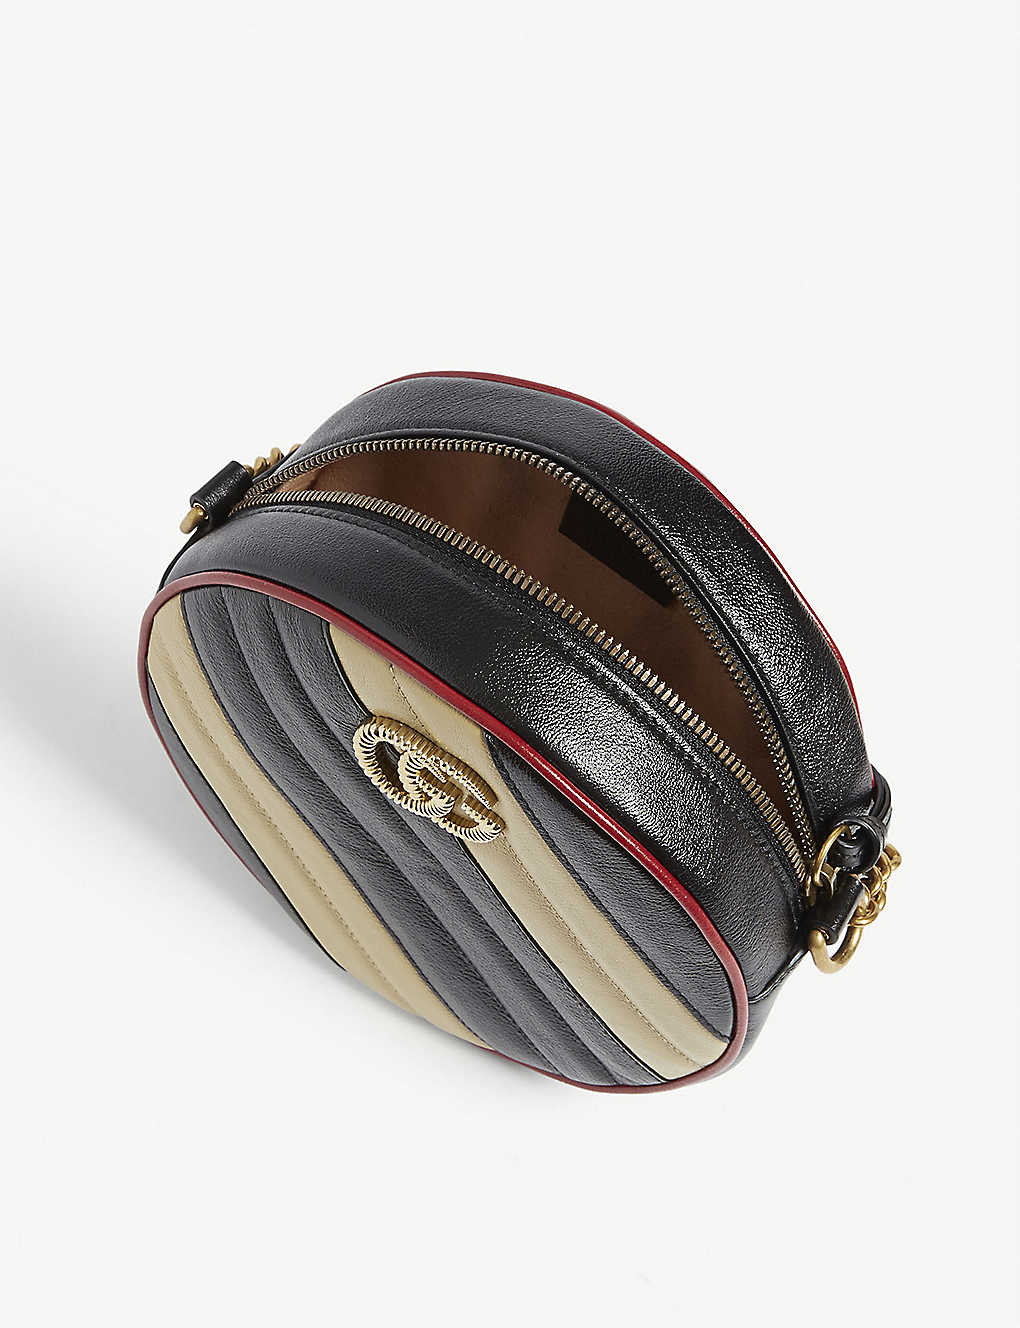 7457ff990 ... GG Marmont mini leather shoulder bag - Nero diagonal beige zoom